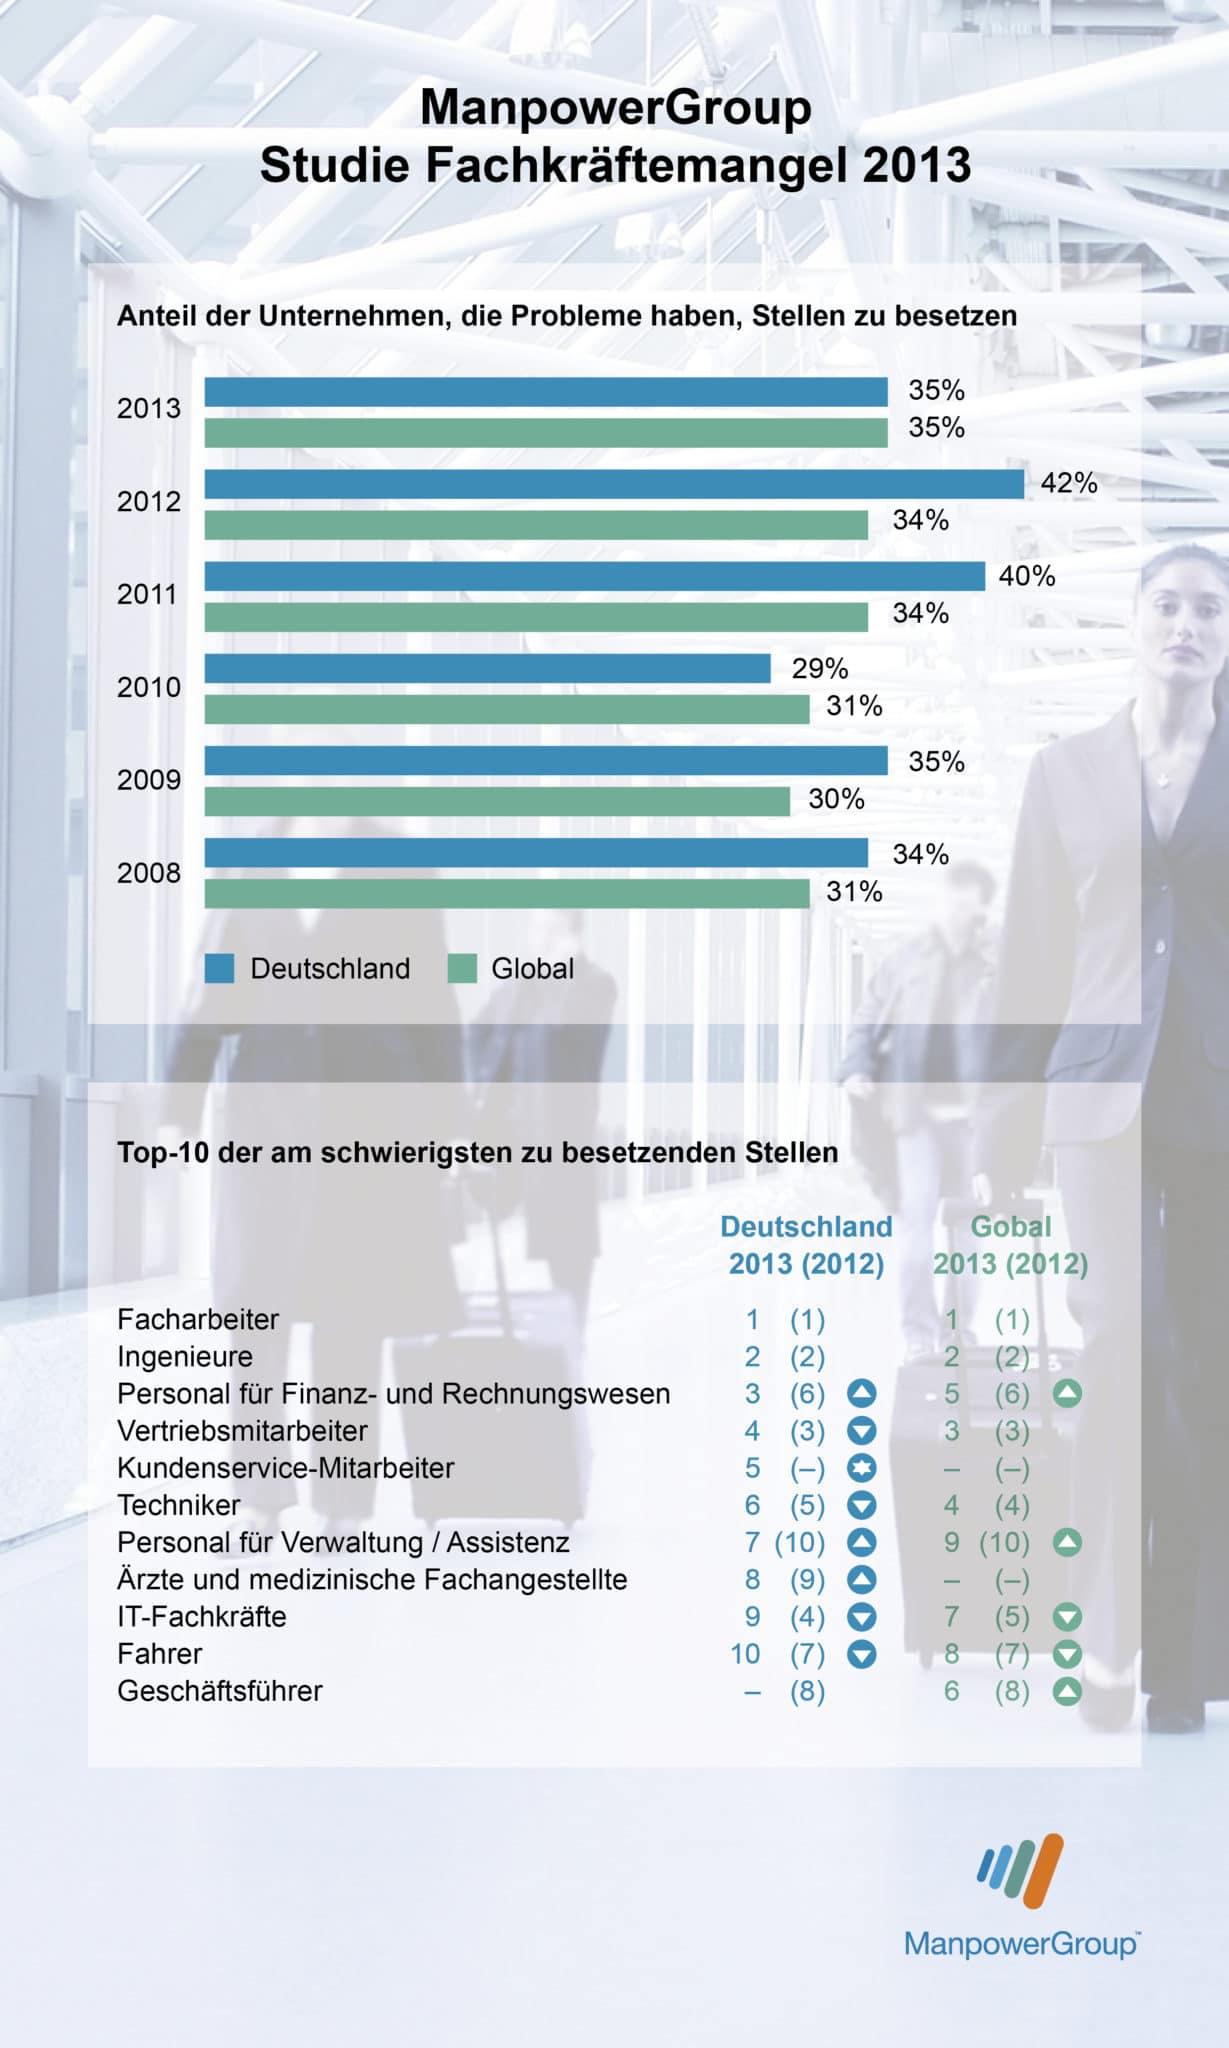 ManpowerGroup Studie FachkrŠftemangel 2013